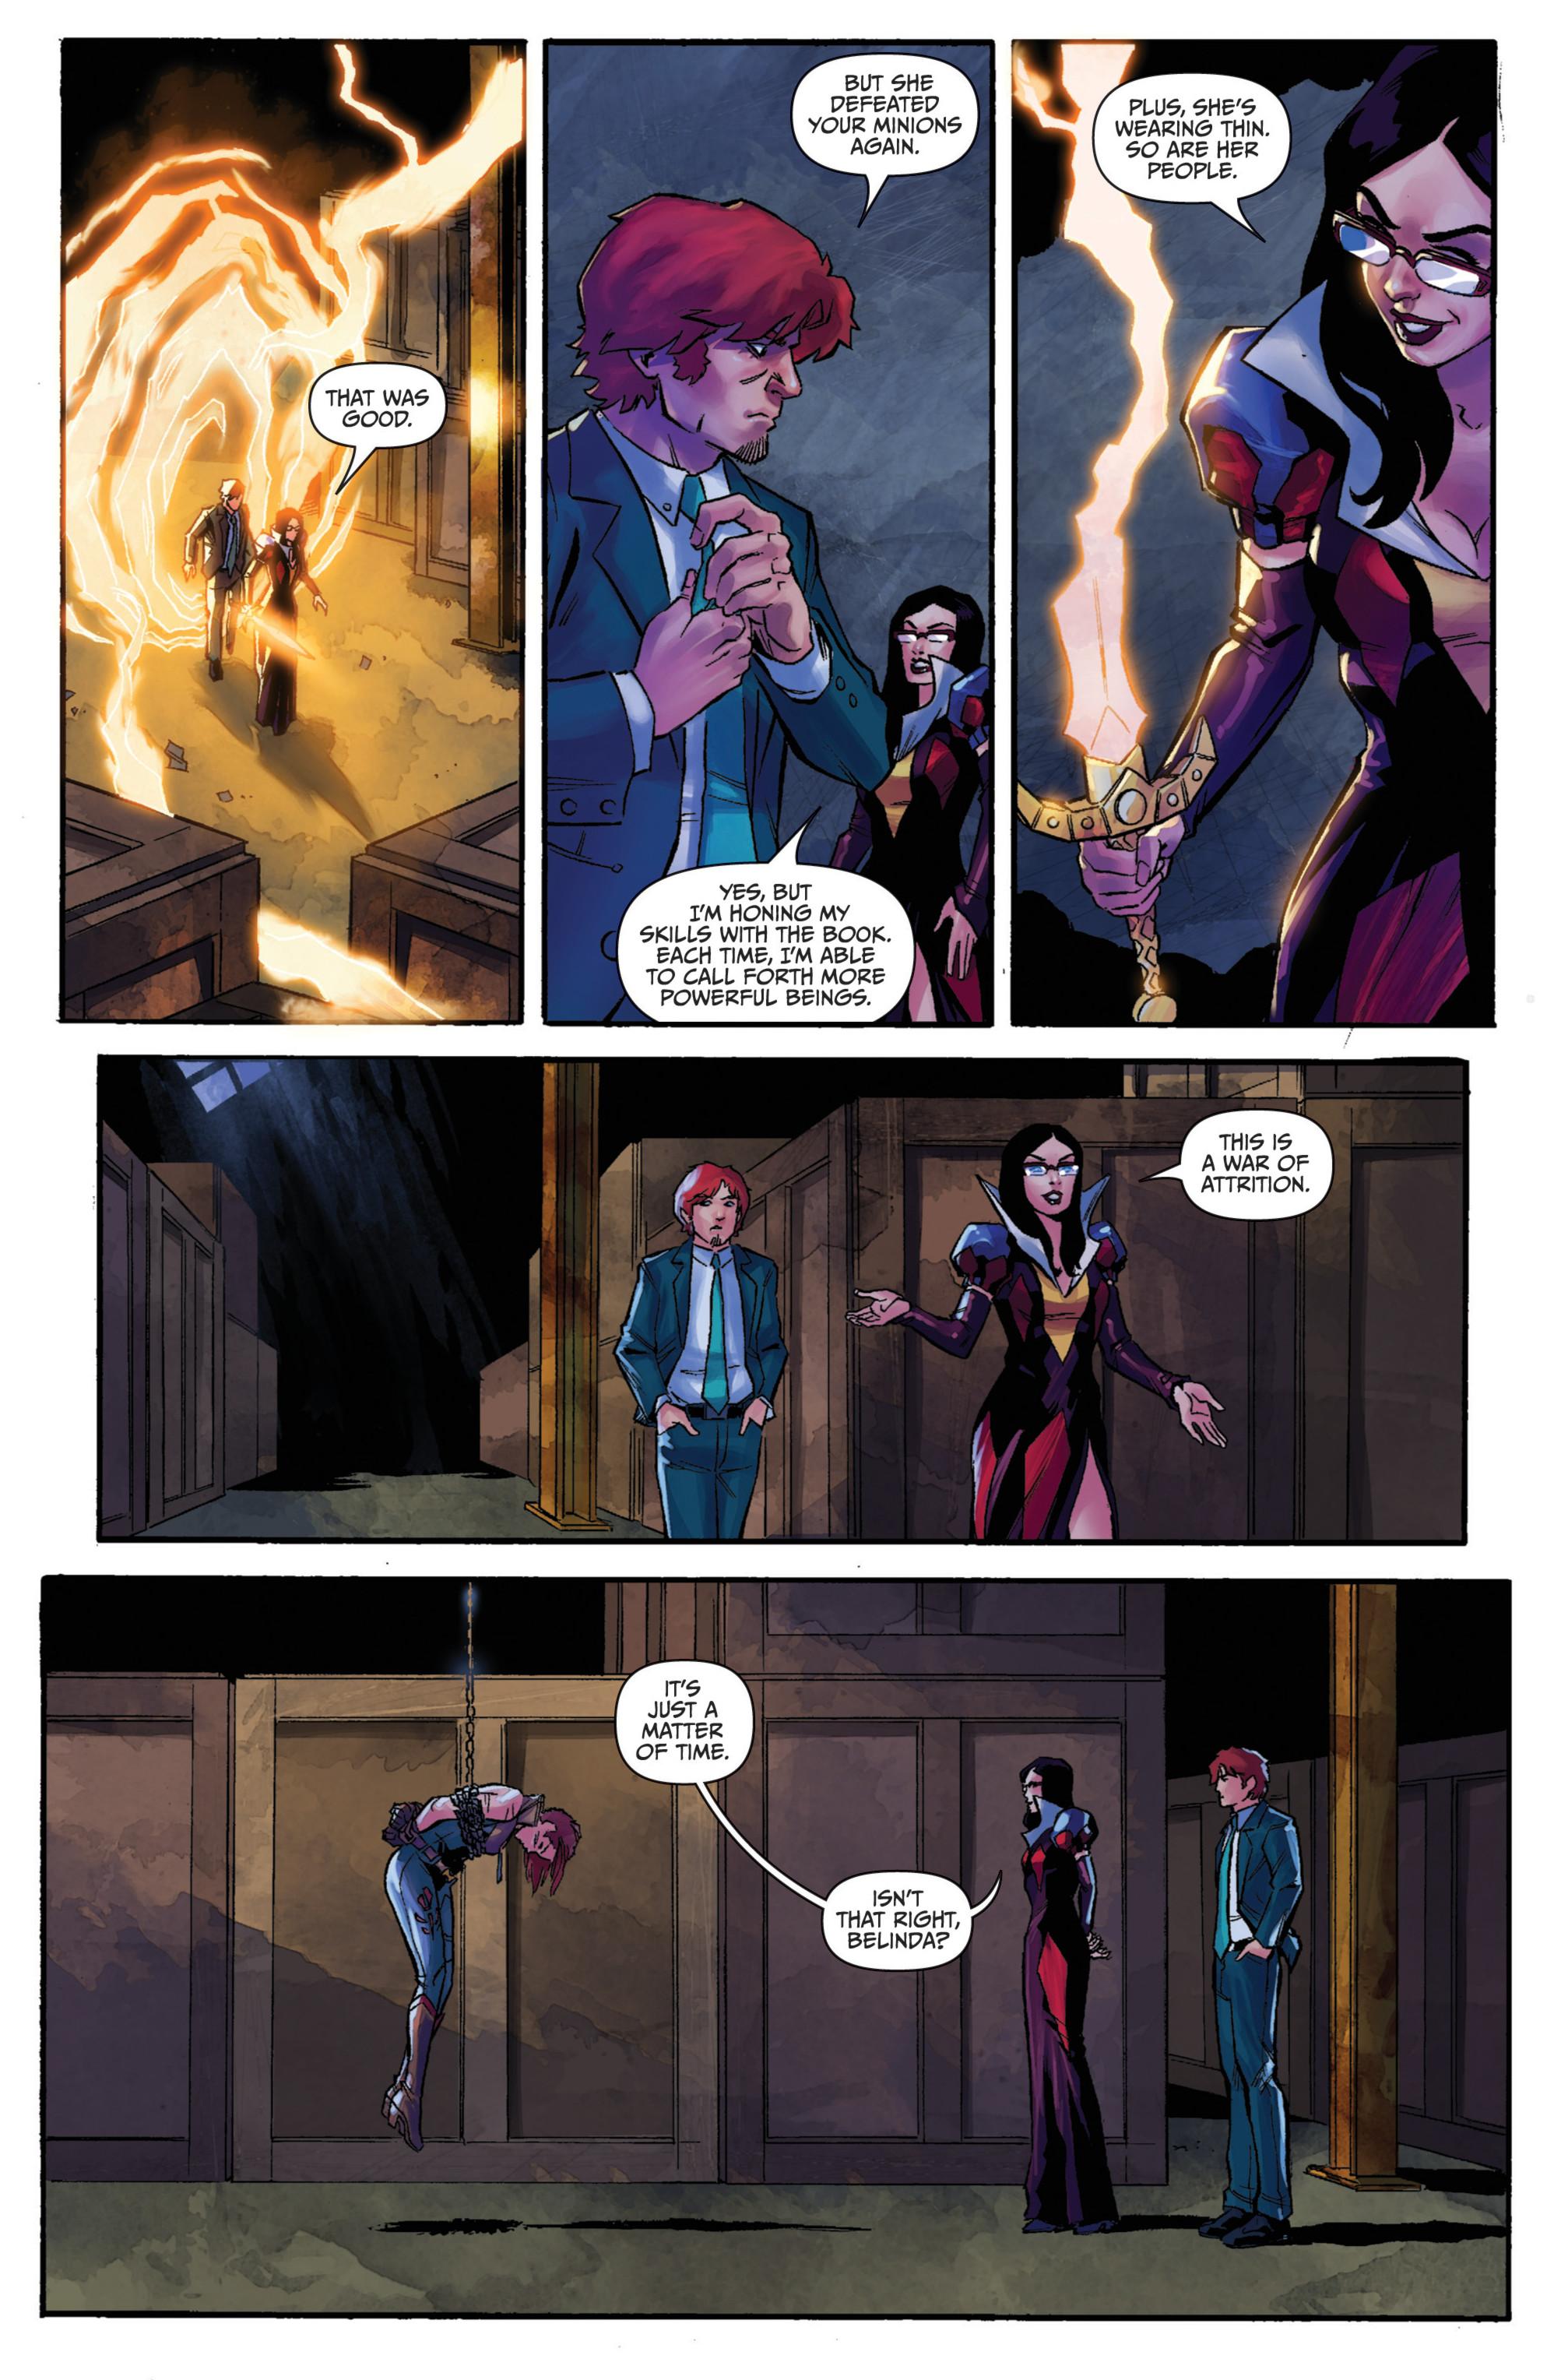 Read online Snow White vs. Snow White comic -  Issue #2 - 13